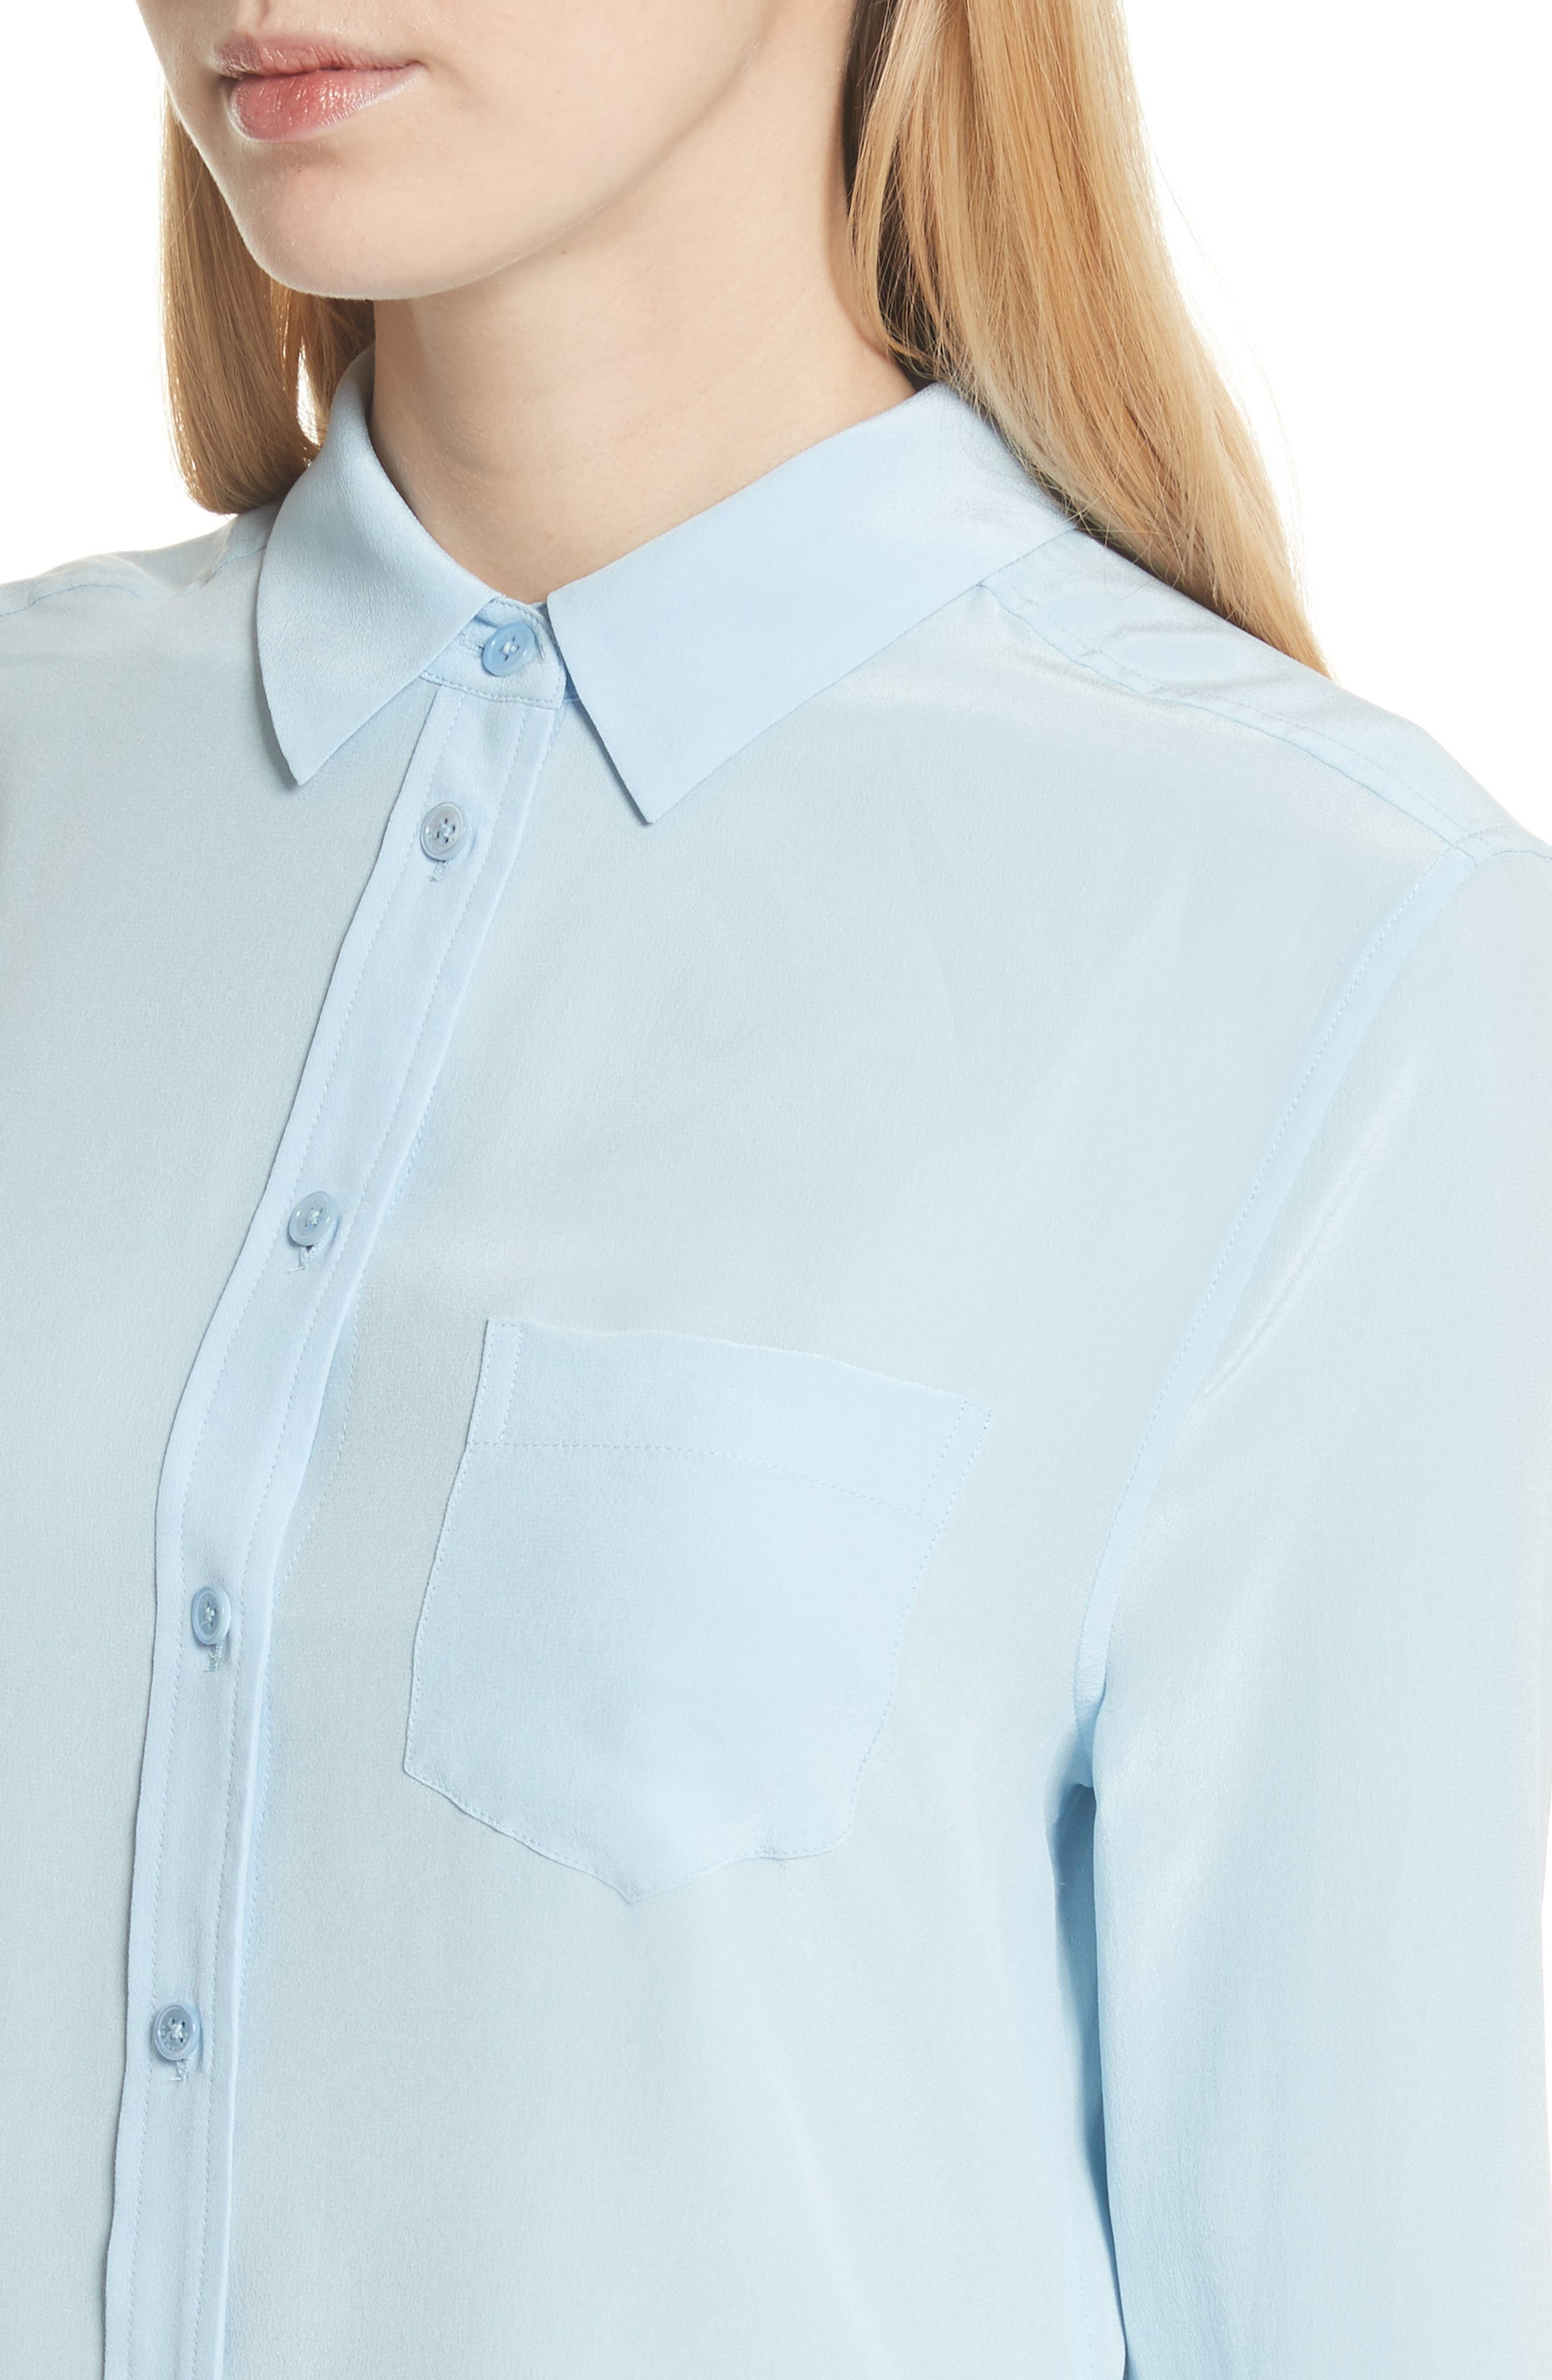 Darla Bell Cuff Shirt,                             Alternate thumbnail 12, color,